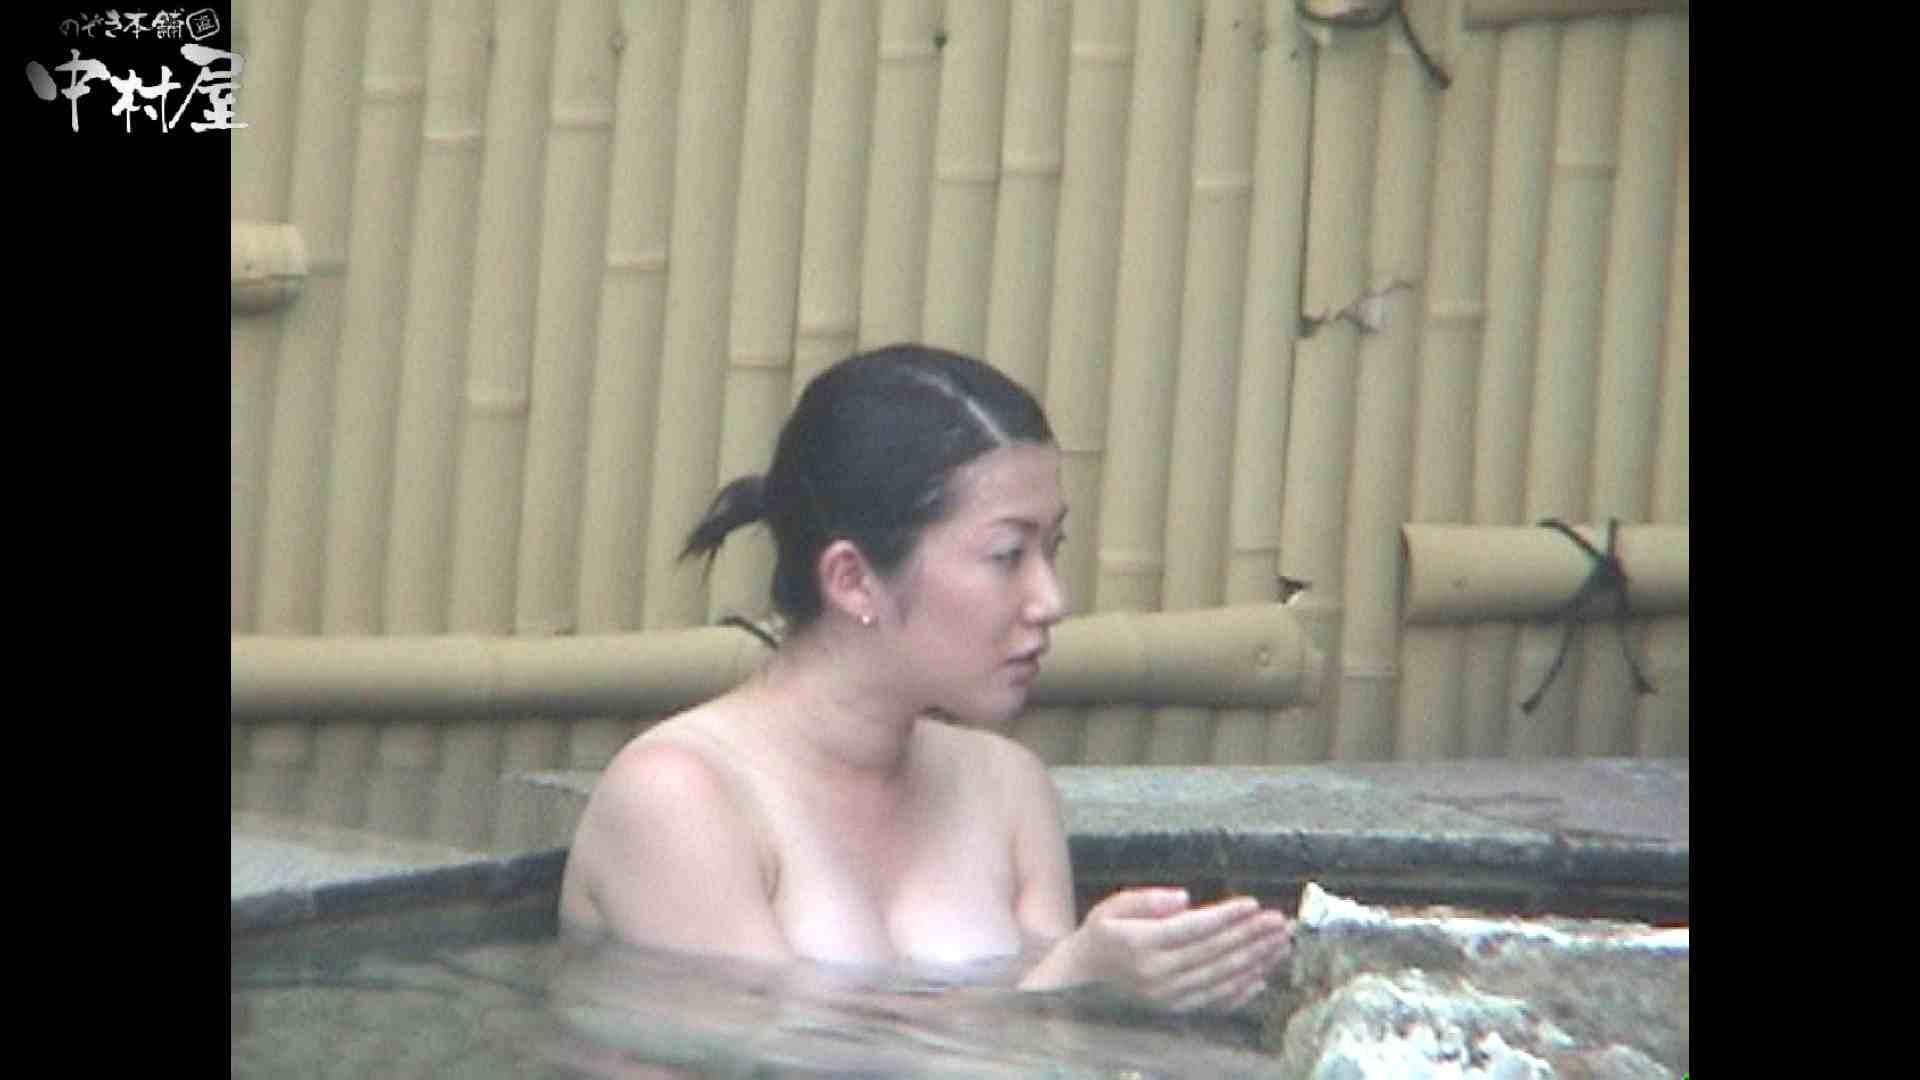 Aquaな露天風呂Vol.961 露天風呂 | OLのエロ生活  104連発 97